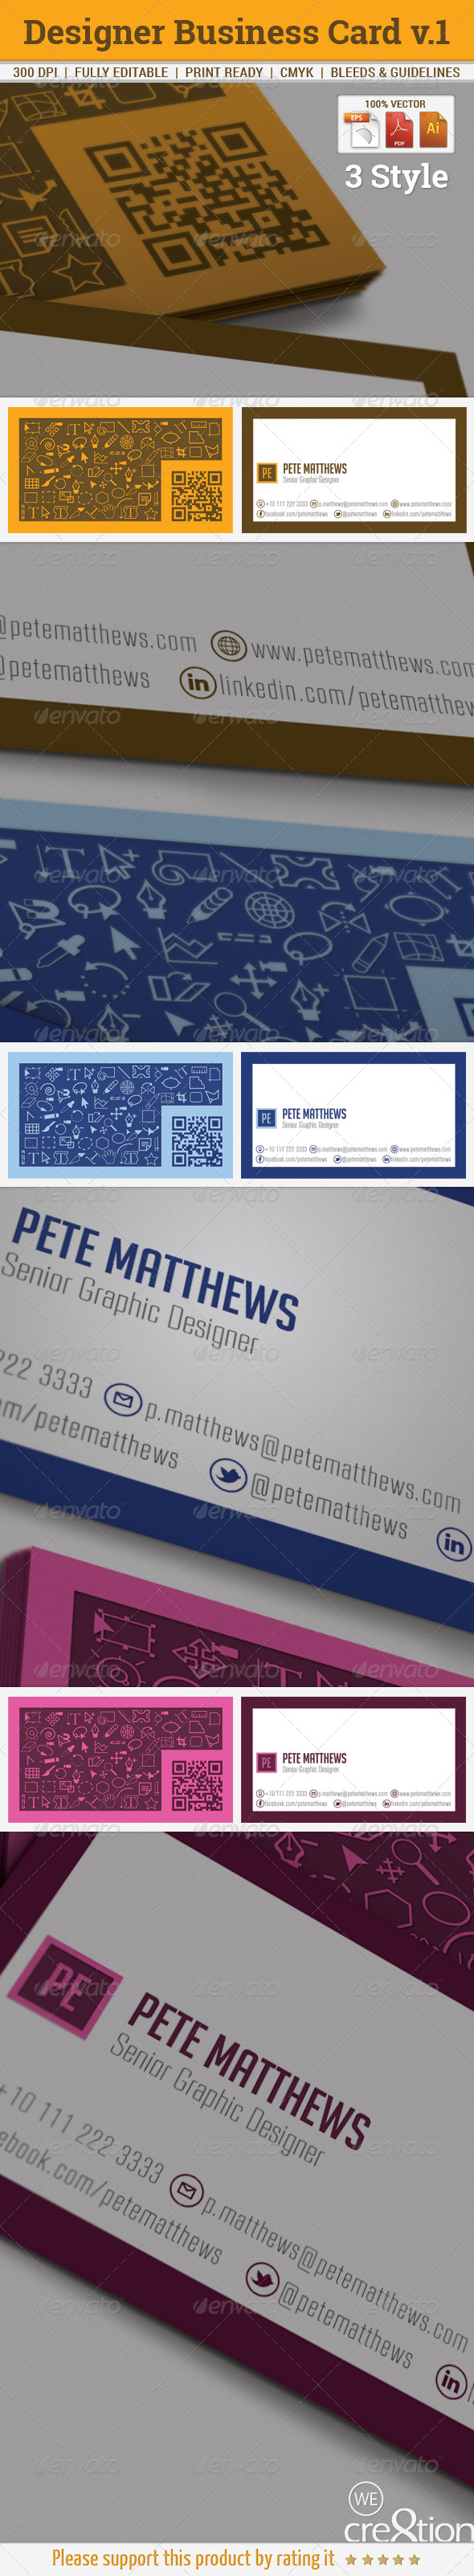 GraphicRiver Designer Business Card Vol 1 5981442